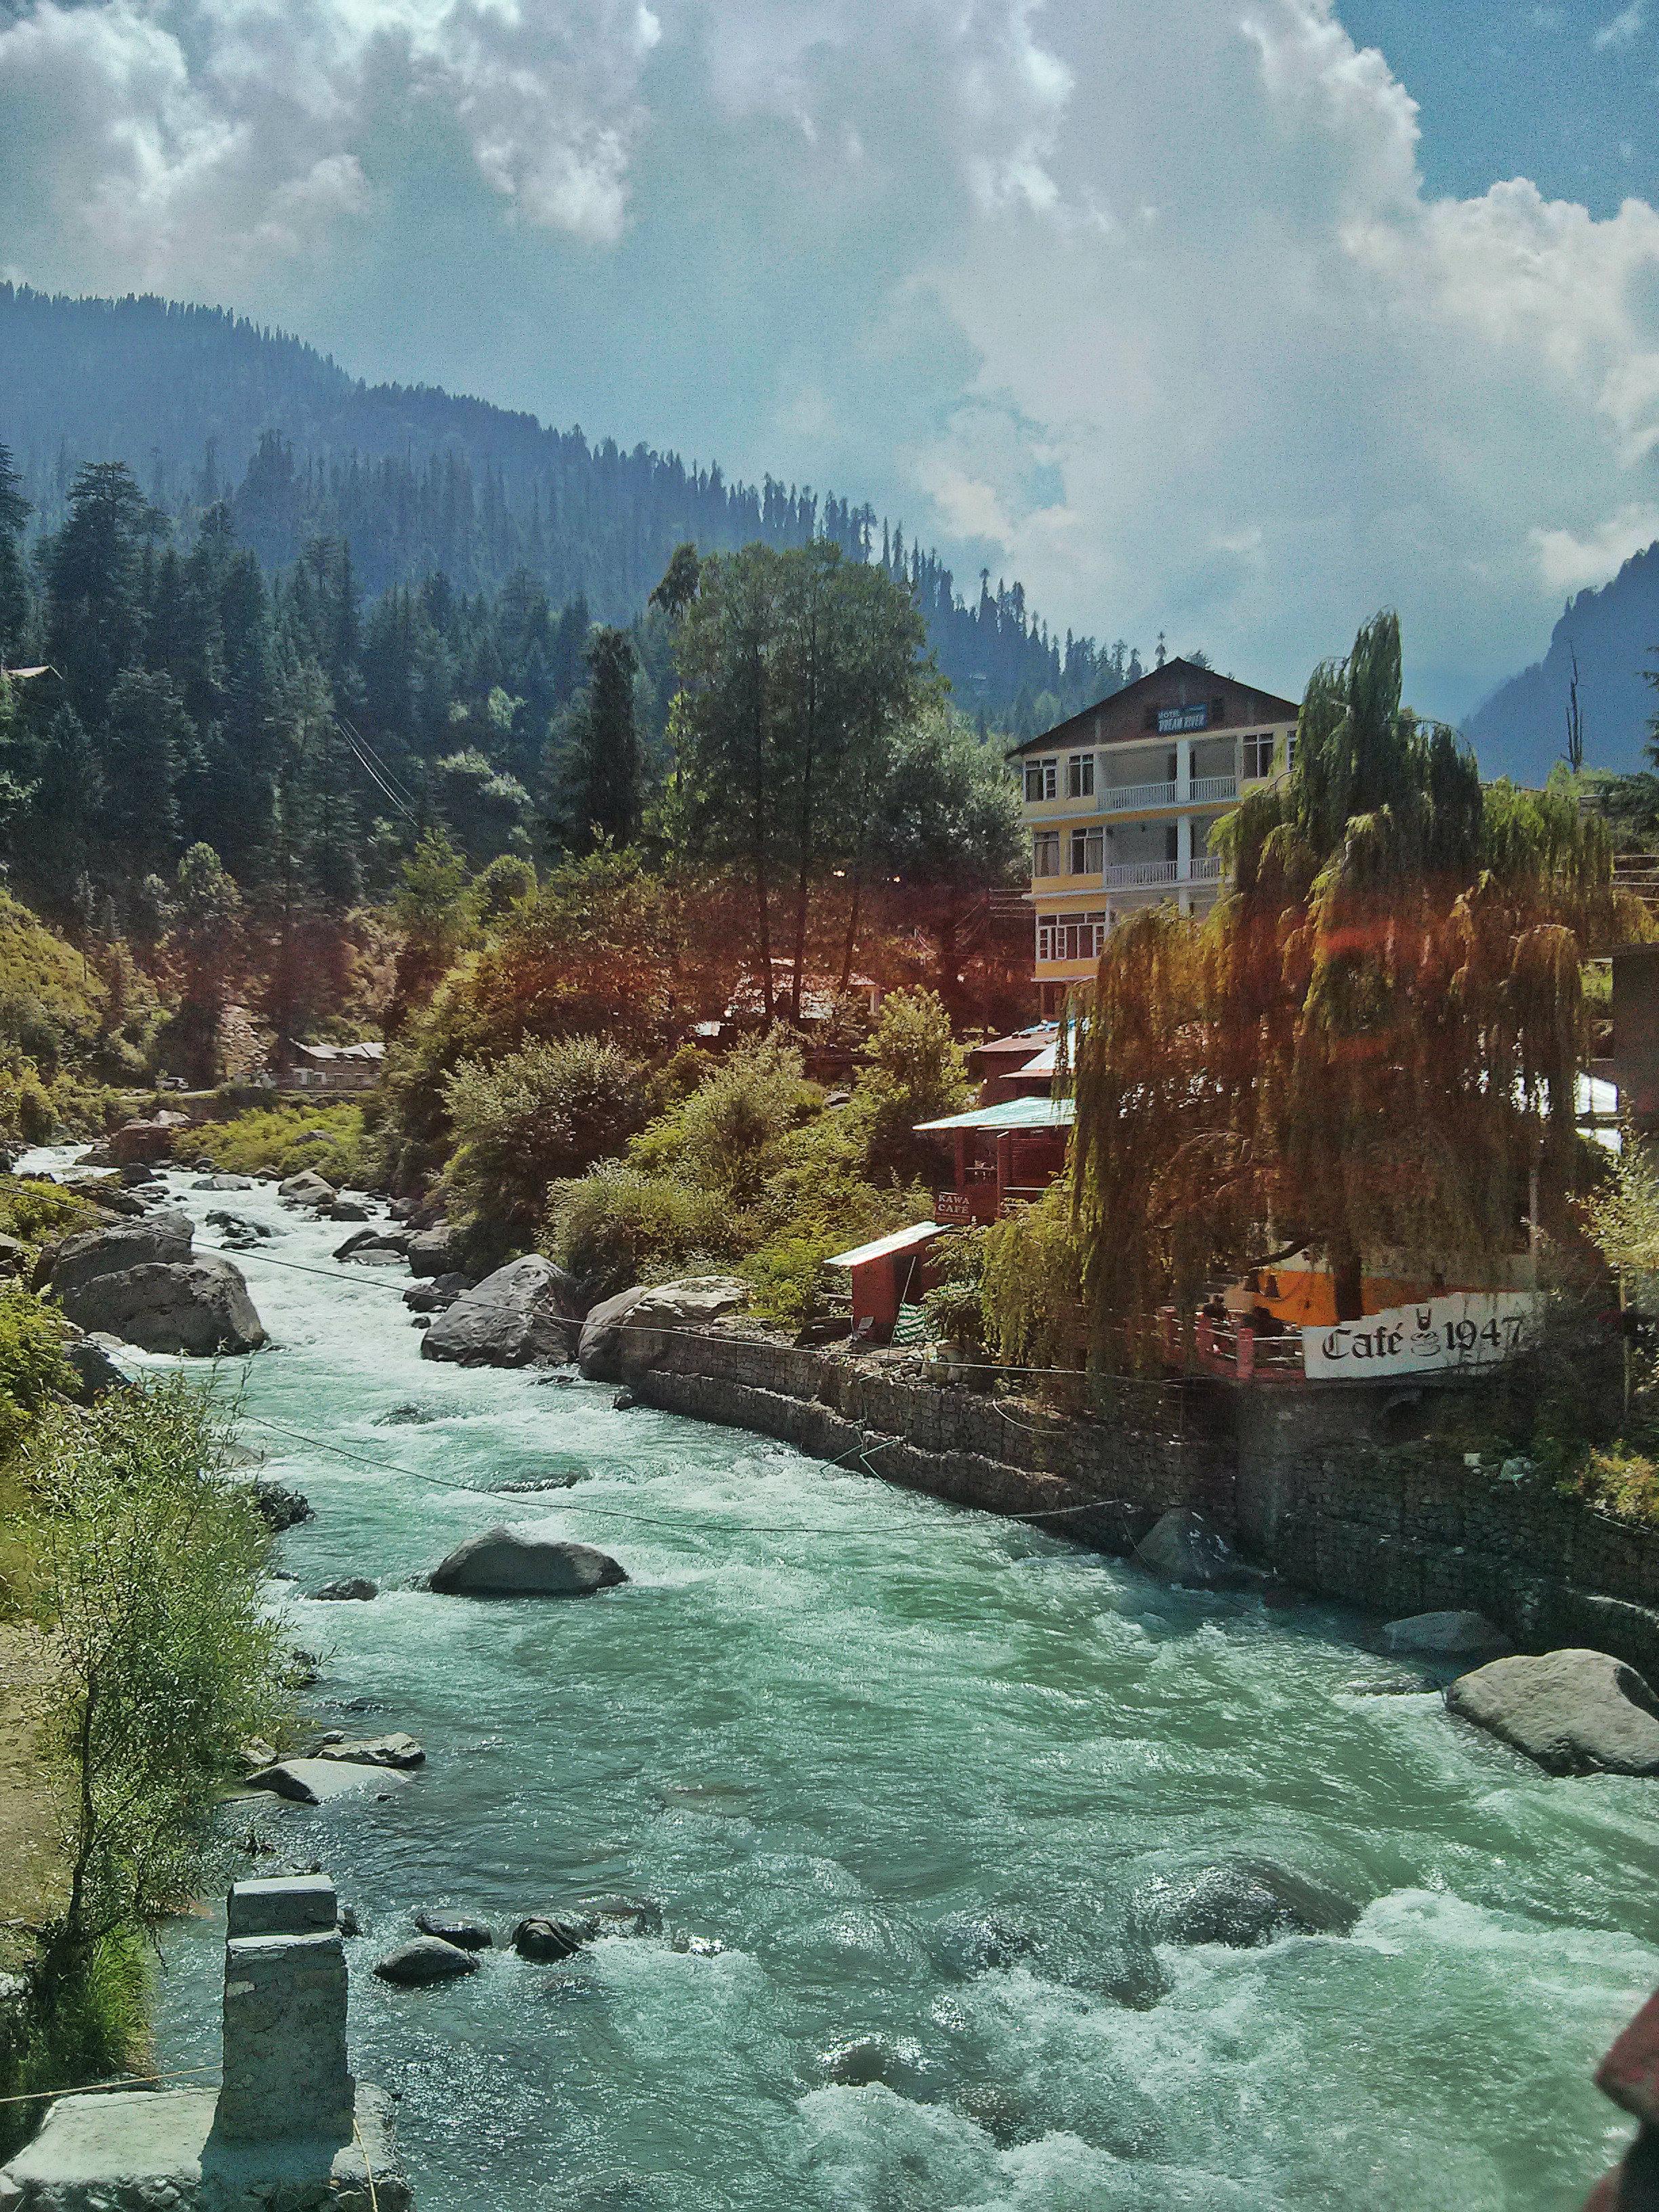 Himalayas – The Last Shangri-La